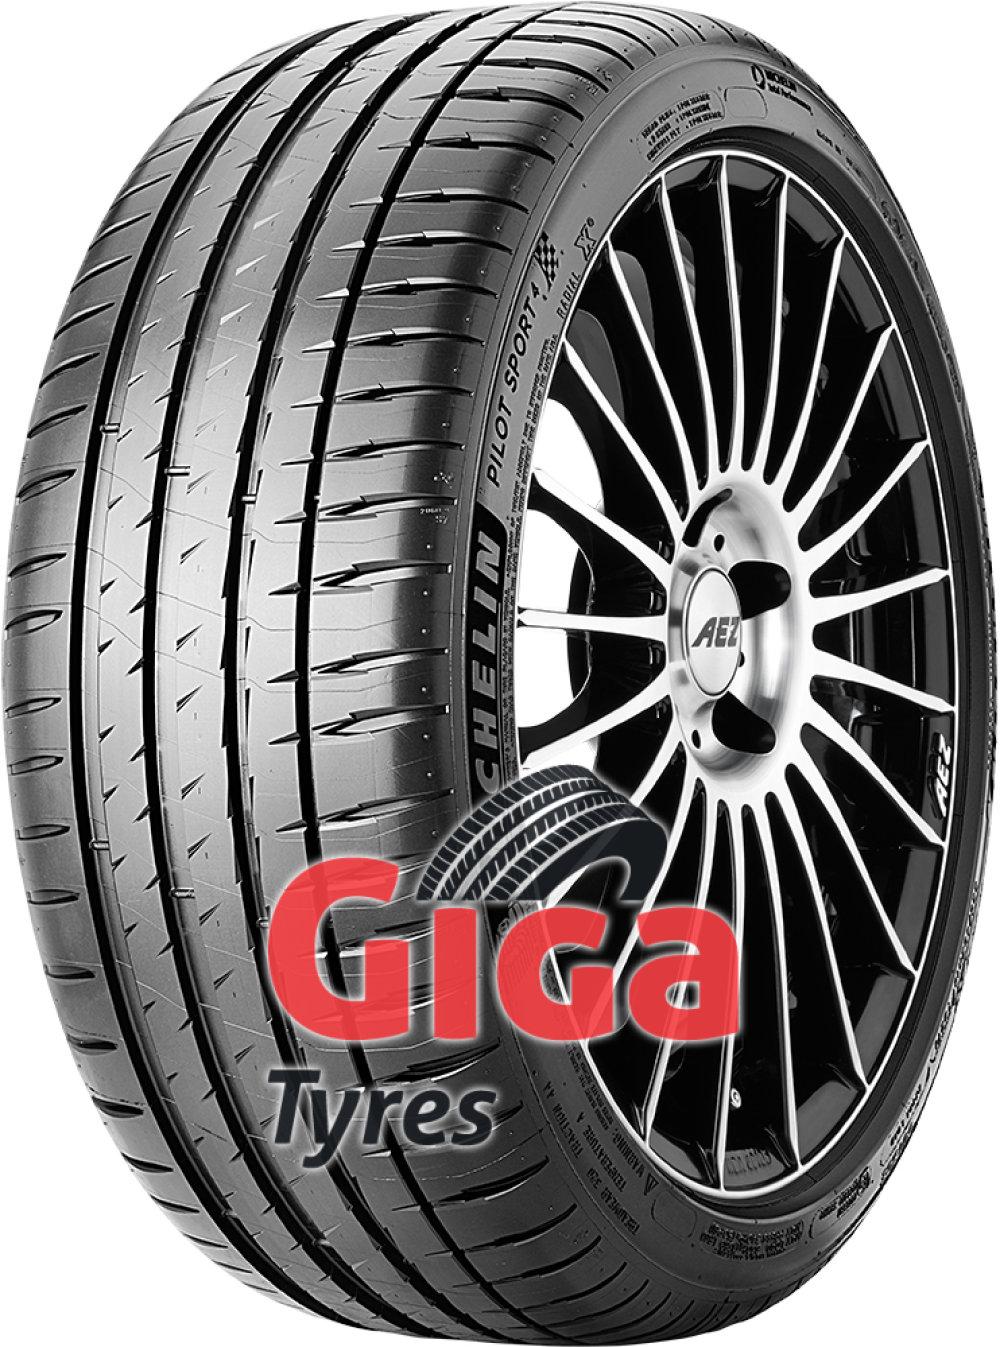 Michelin Pilot Sport 4 ( 255/45 ZR18 (103Y) XL with rim protection ridge (FSL) )